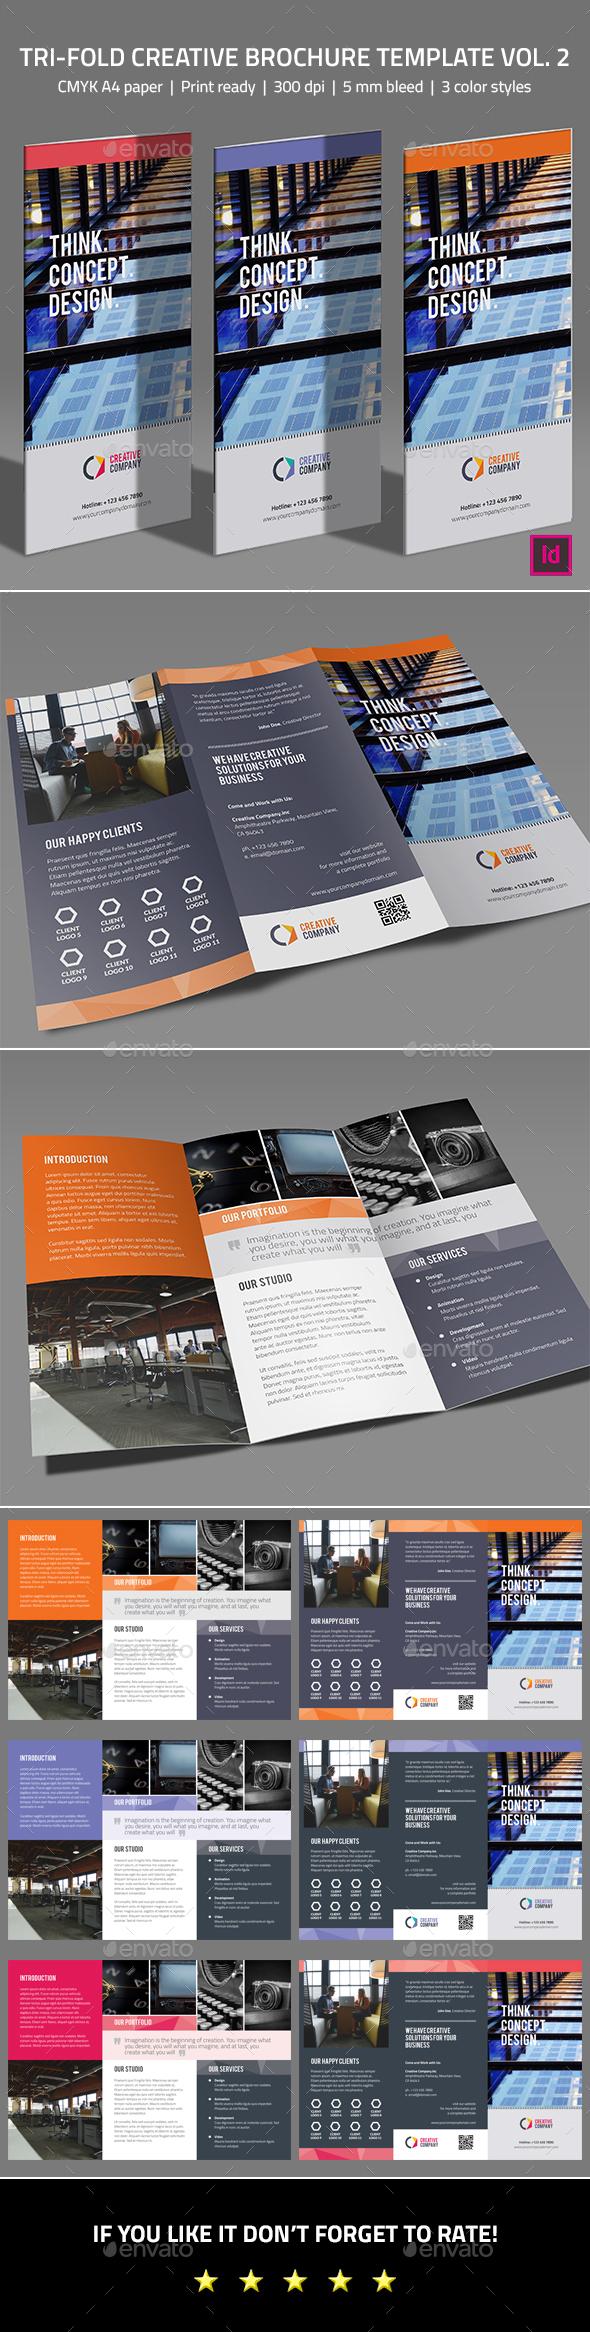 Tri-fold Creative  Brochure Template Vol. 2 - Corporate Business Cards